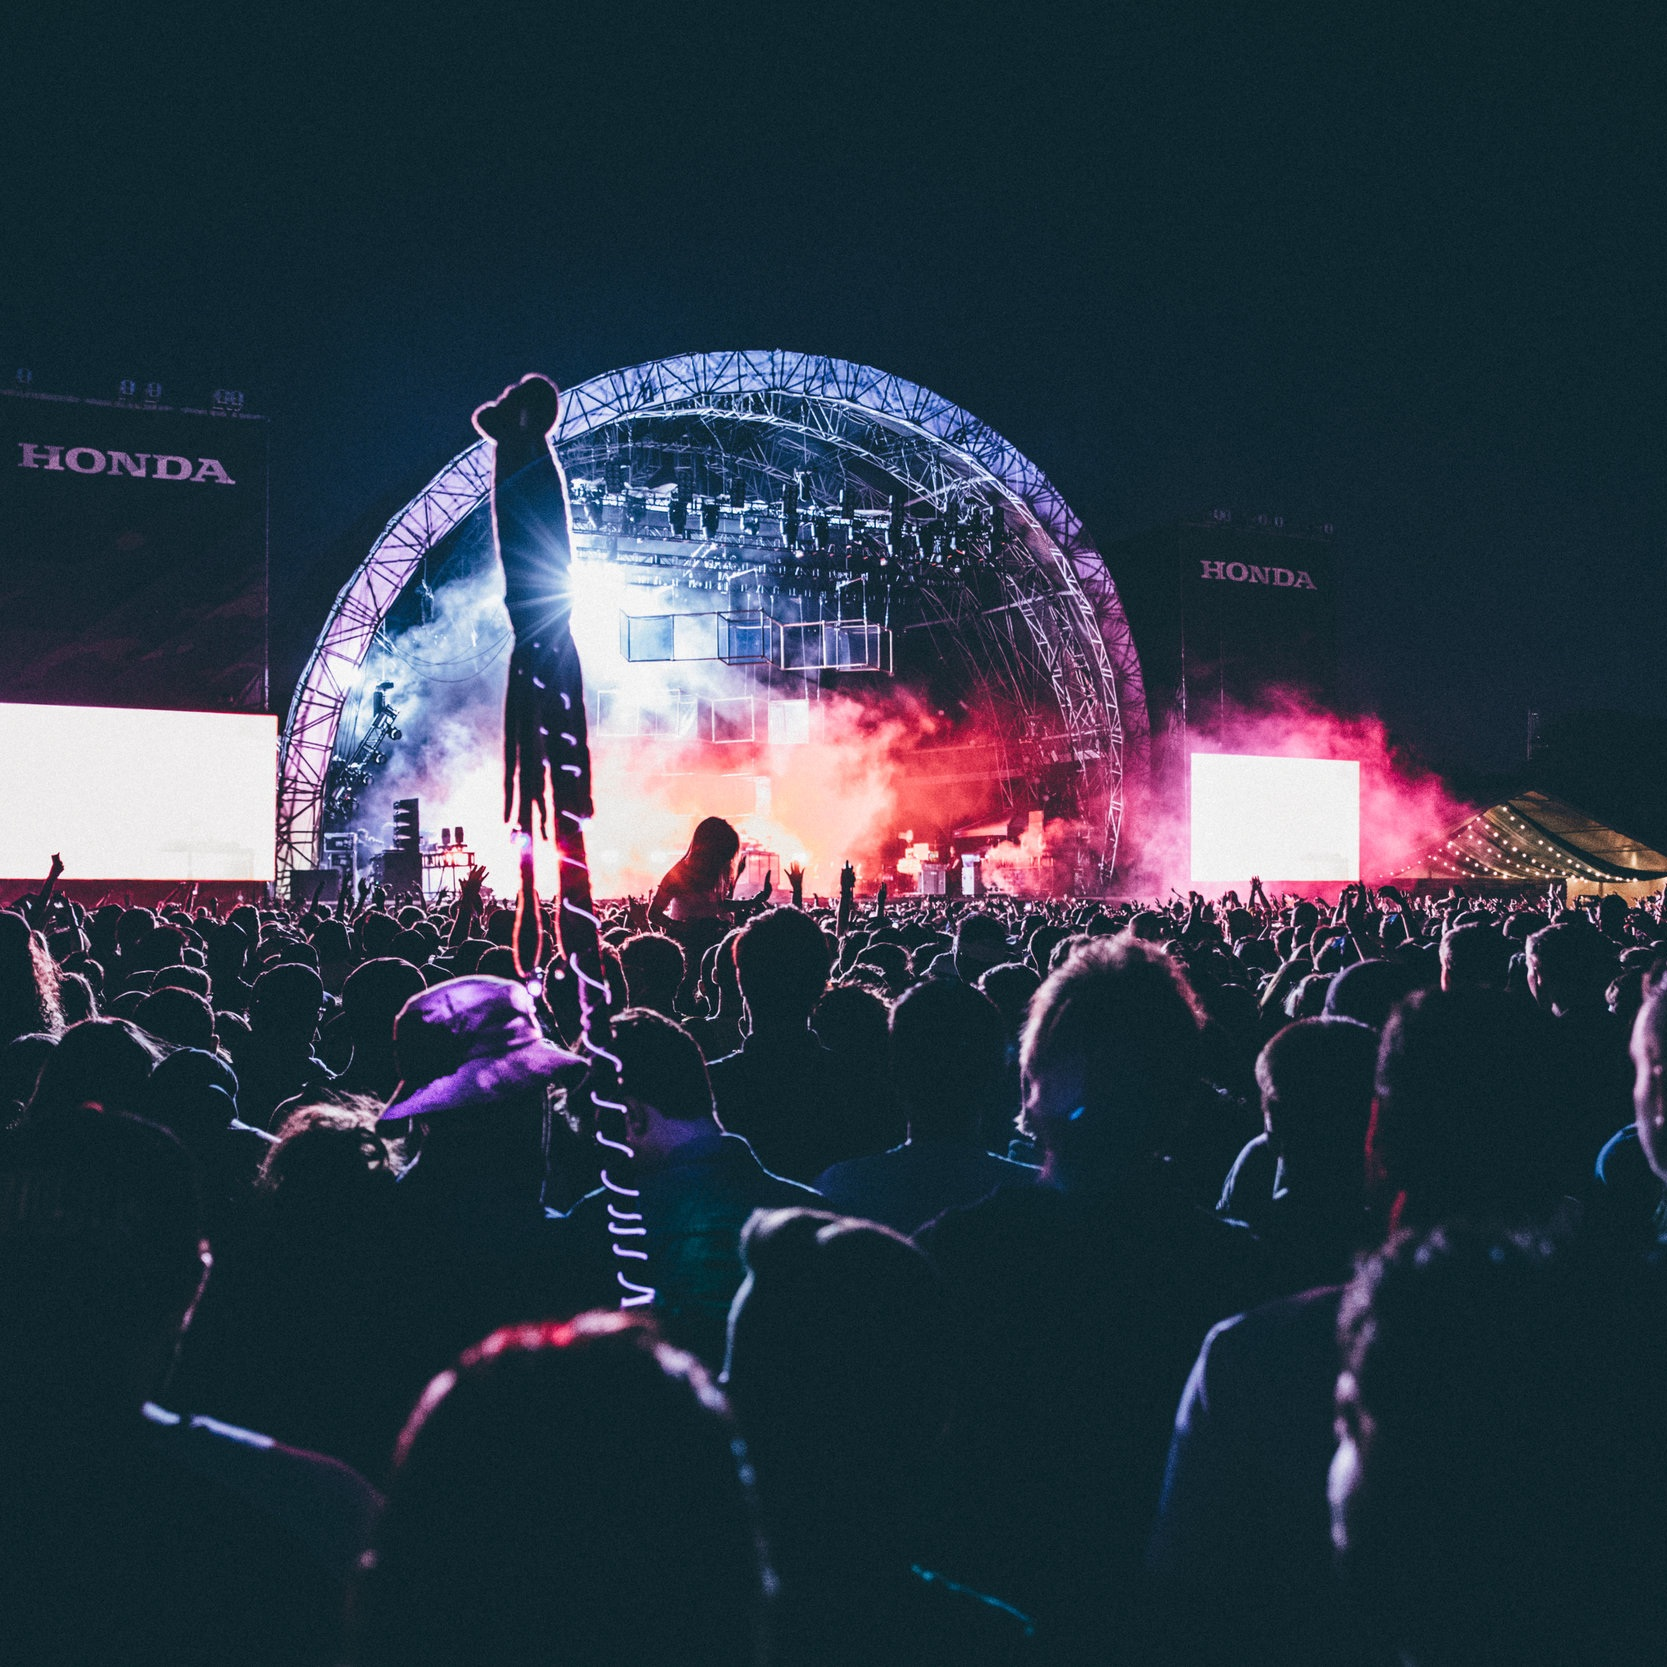 USC Events [Paradiso Festival] - Media & Experiential Marketing